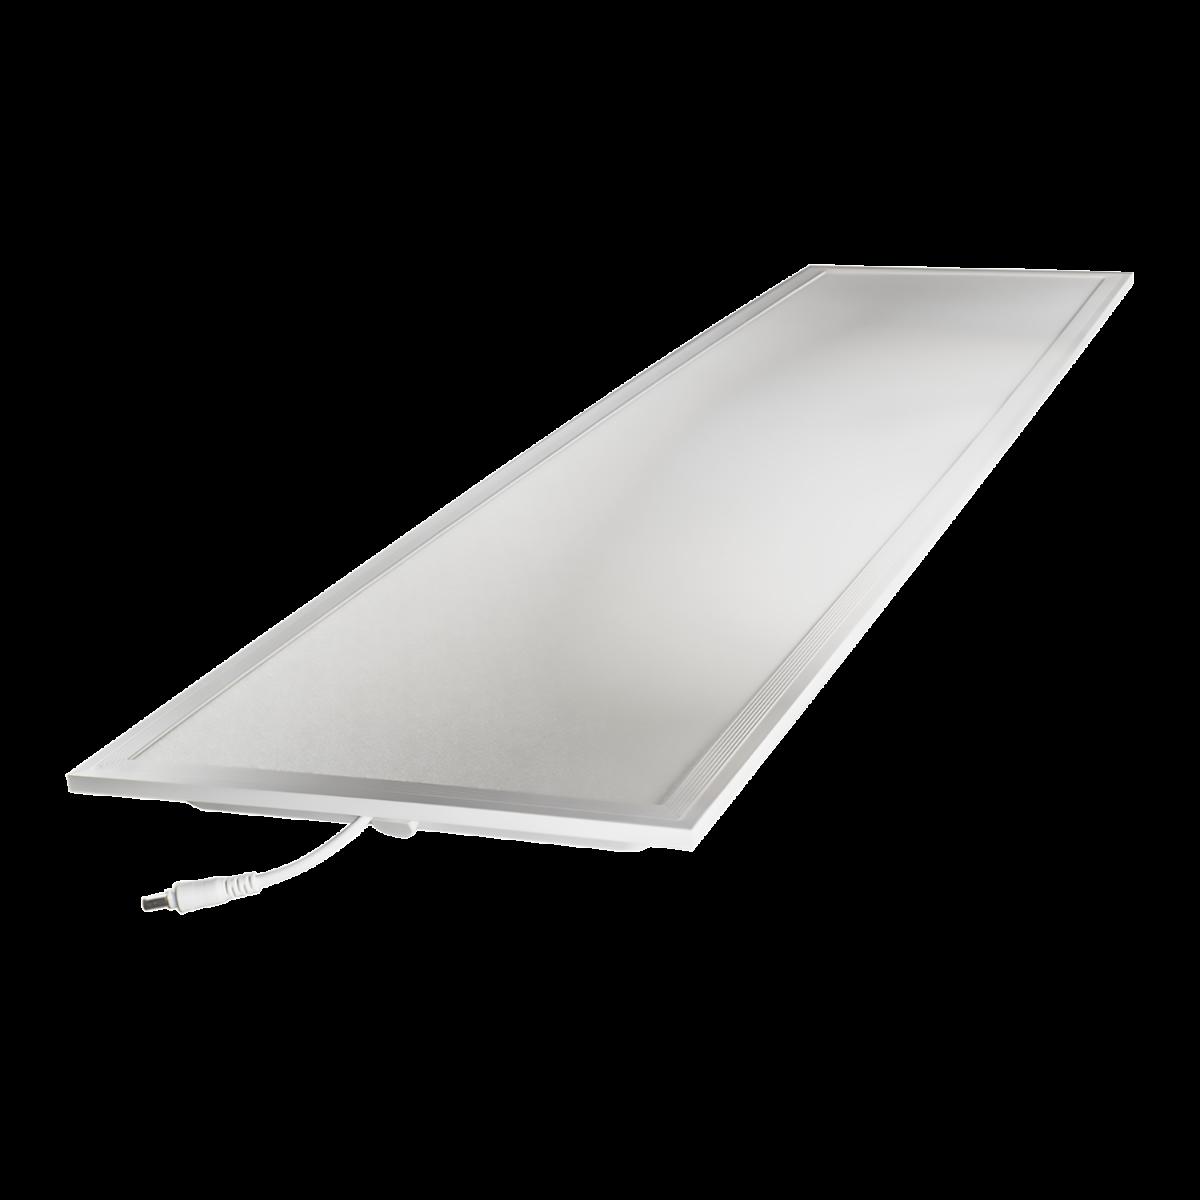 Noxion LED Panel Delta Pro Highlum V2.0 40W 30x120cm 4000K 5480lm UGR <19   Kallvit - Ersättare 2x36W